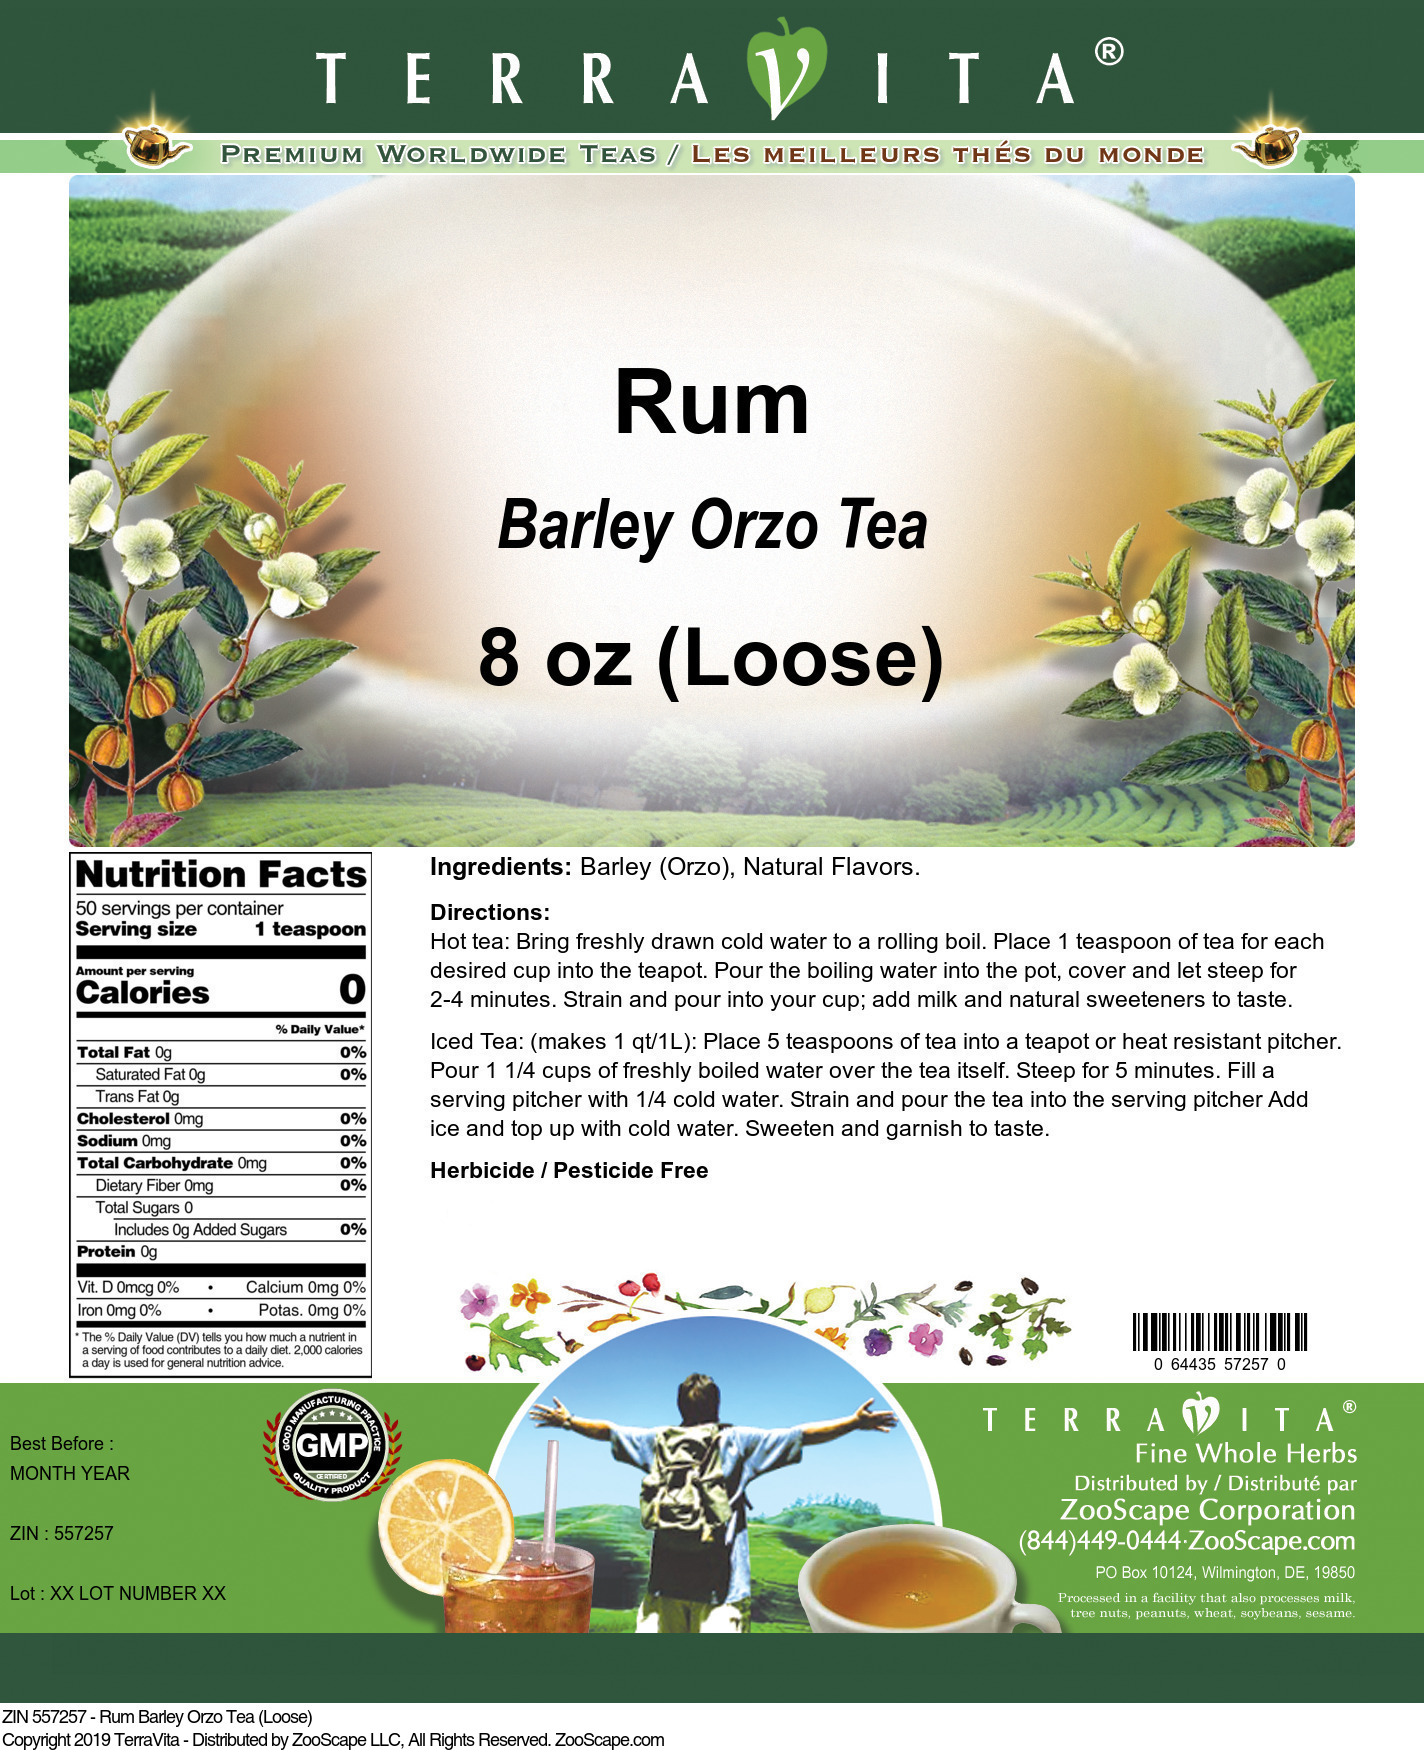 Rum Barley Orzo